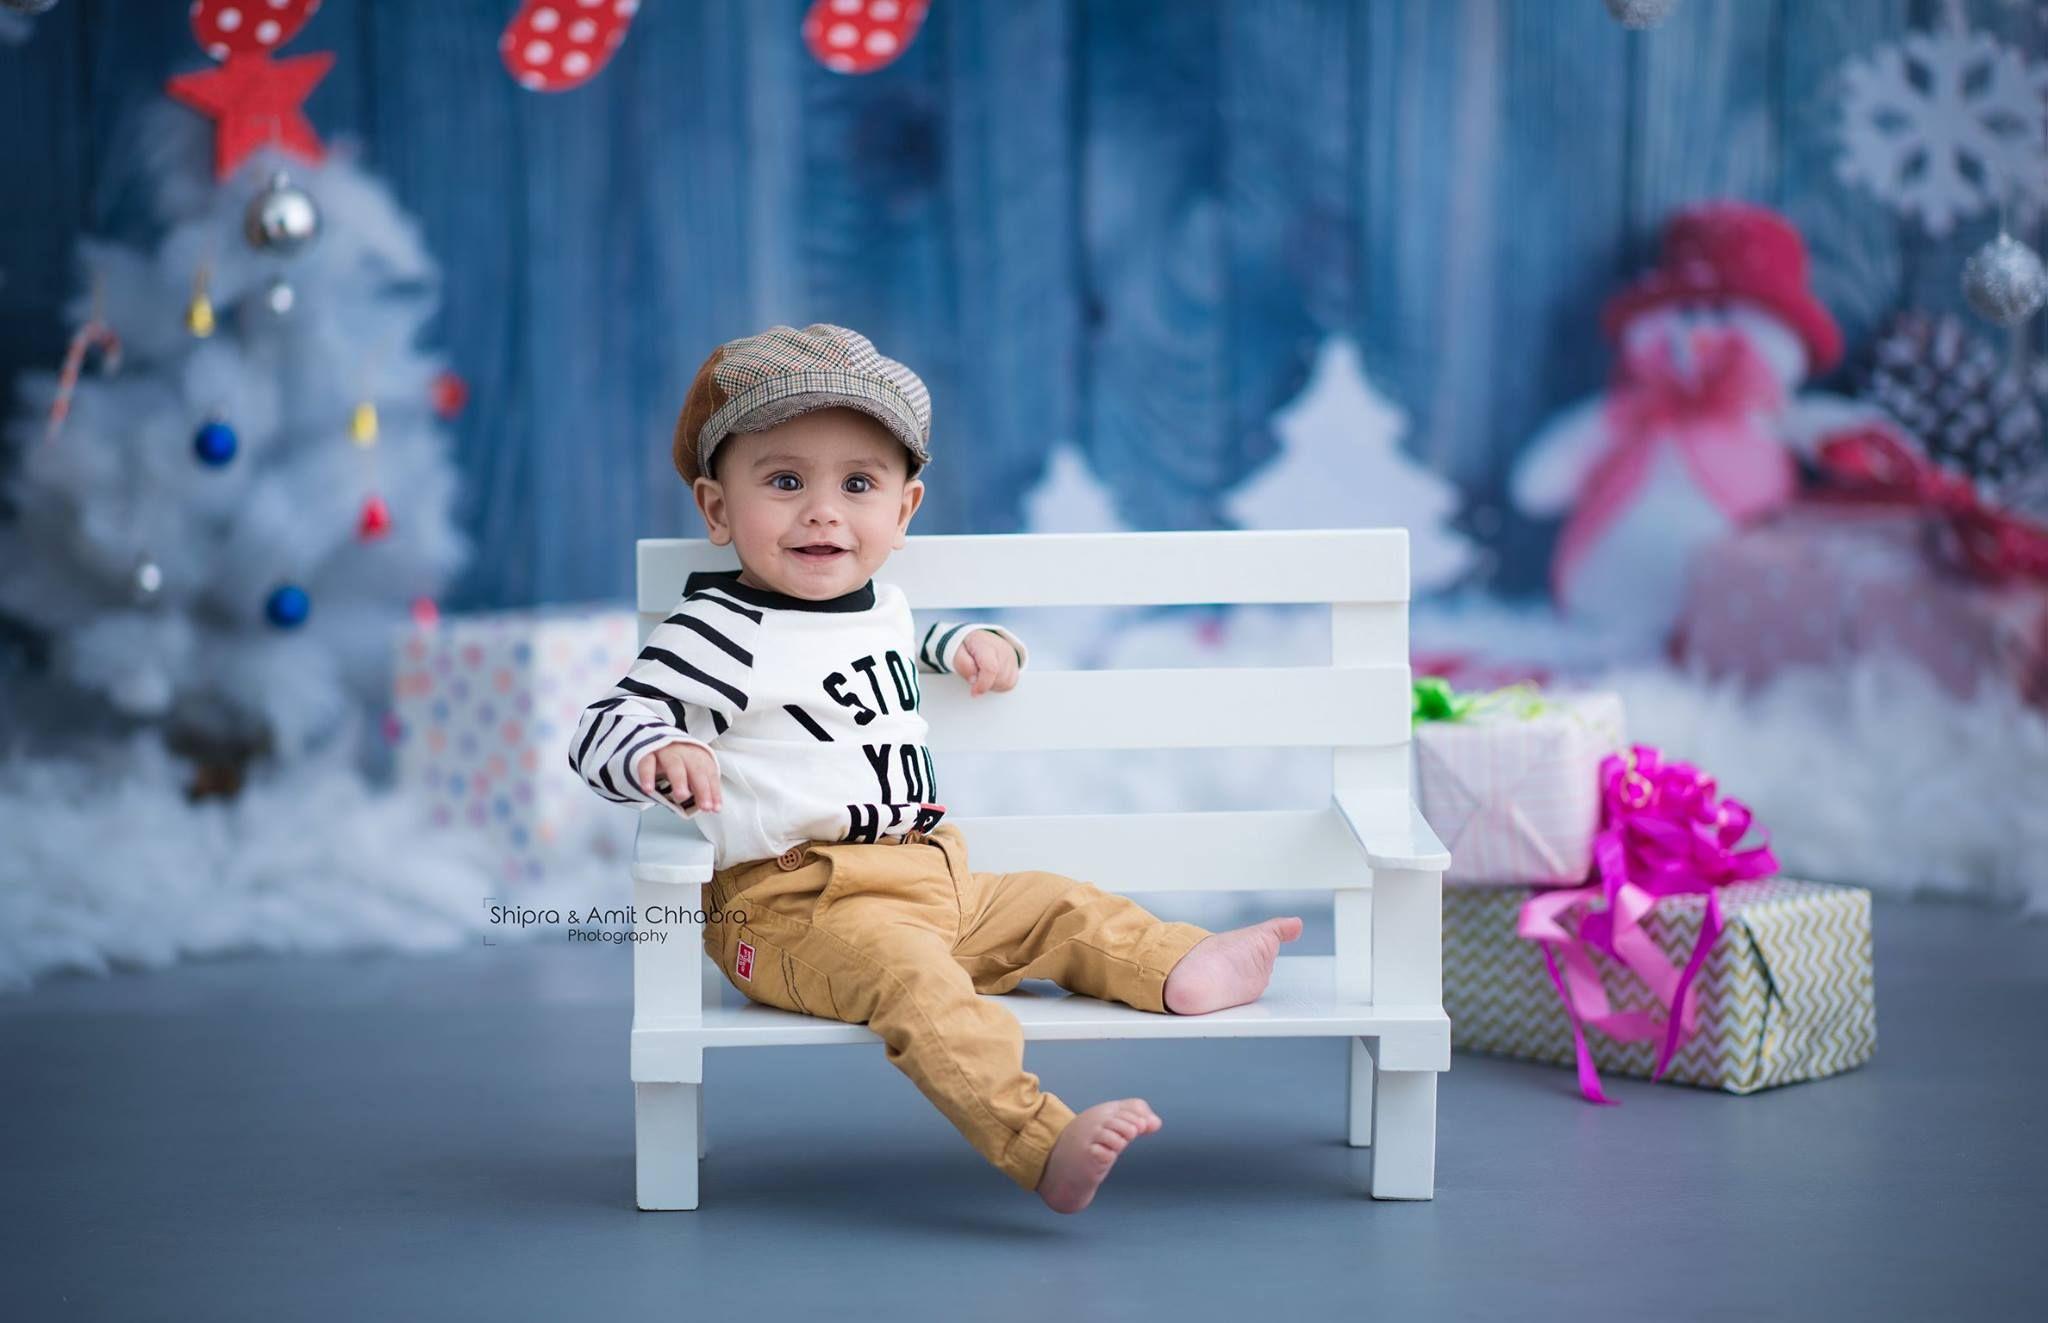 Winter theme christmas tree white christmas tree diy baby photoshoot baby photography kids photoshoot ideas shipra amit chhabra photography